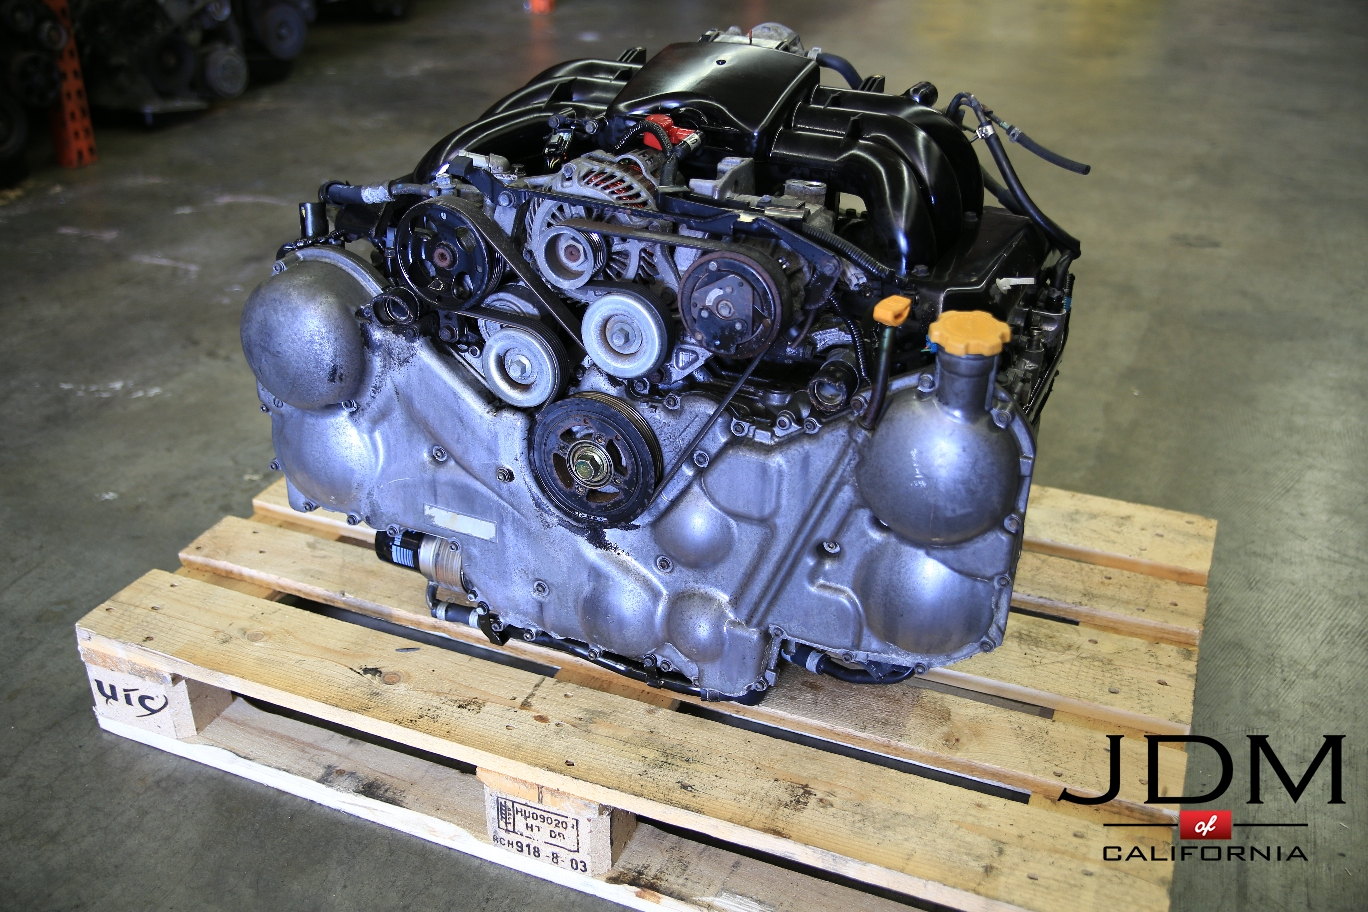 Subaru Legacy Alternator Diagram Jdm Ez30d 3 0l H6 Engine For Subaru Legacy 03 09 Subaru